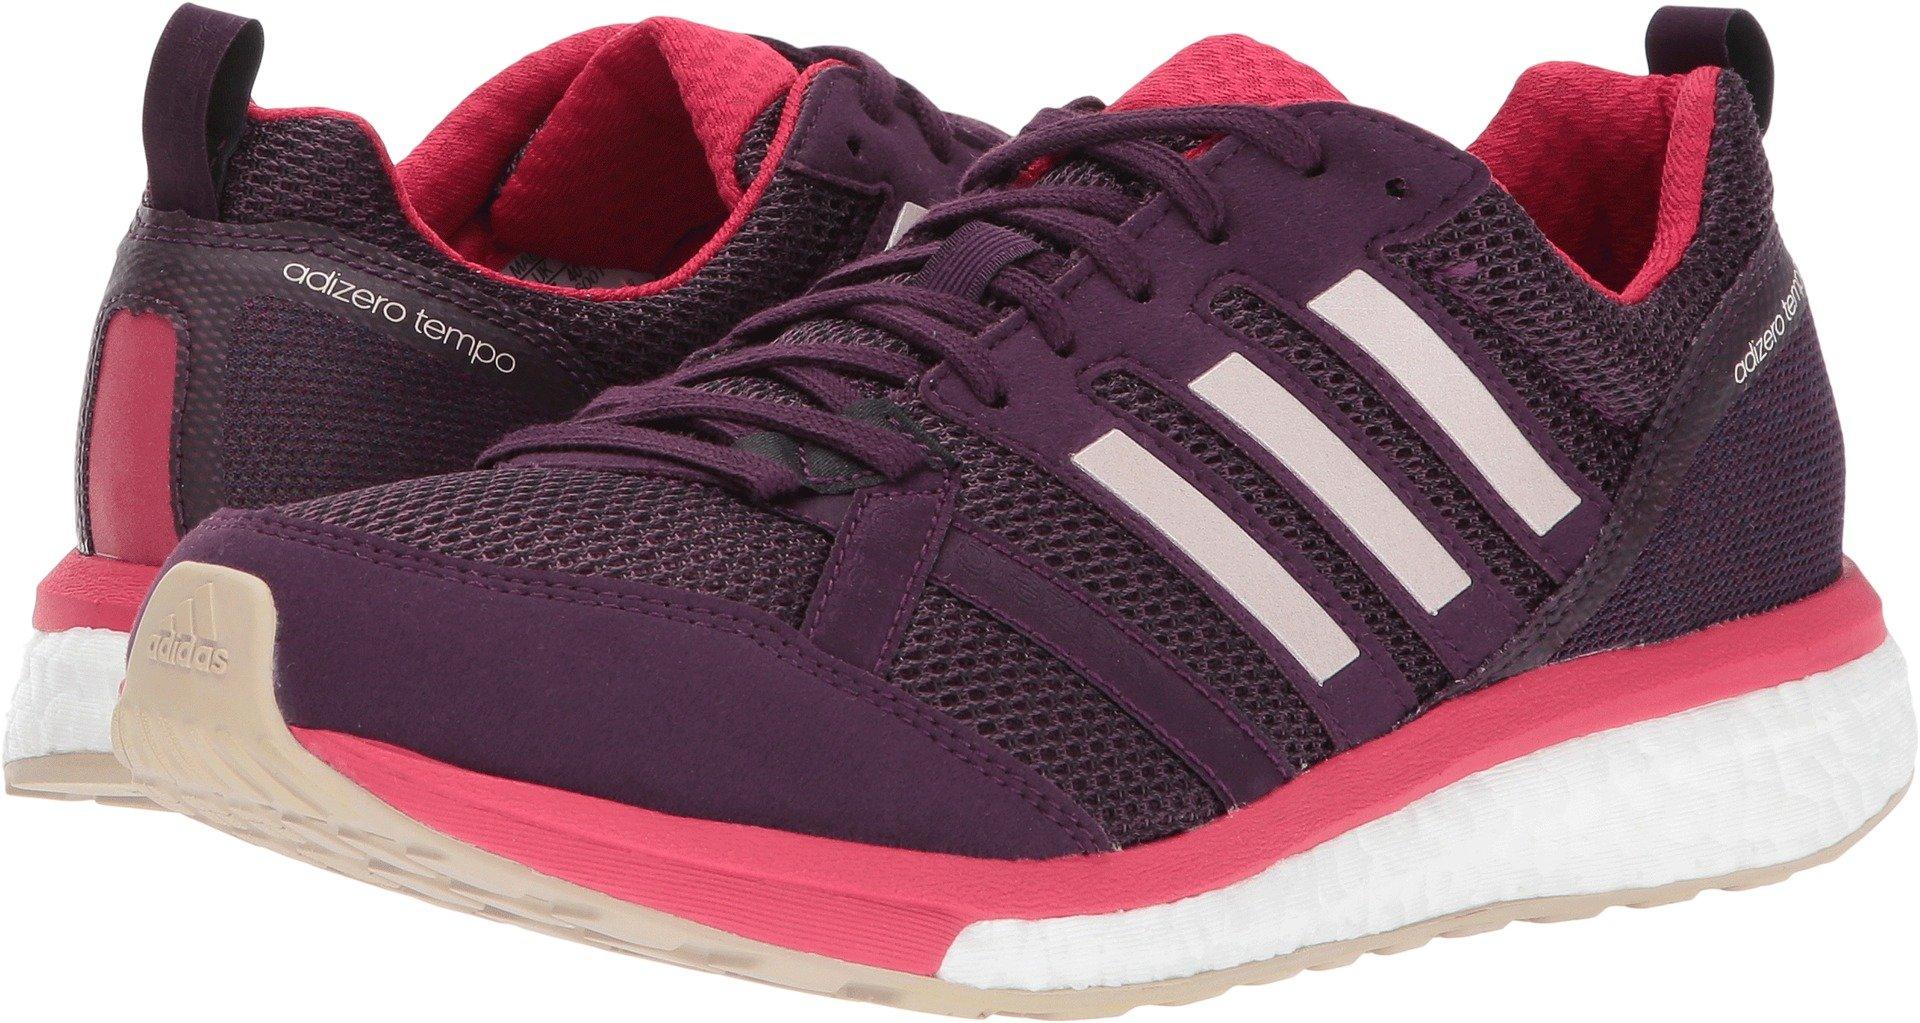 adidas Women's Adizero Tempo 9 w Running Shoe, Red Night/Ice Pink/Energy Pink, 8 Medium US